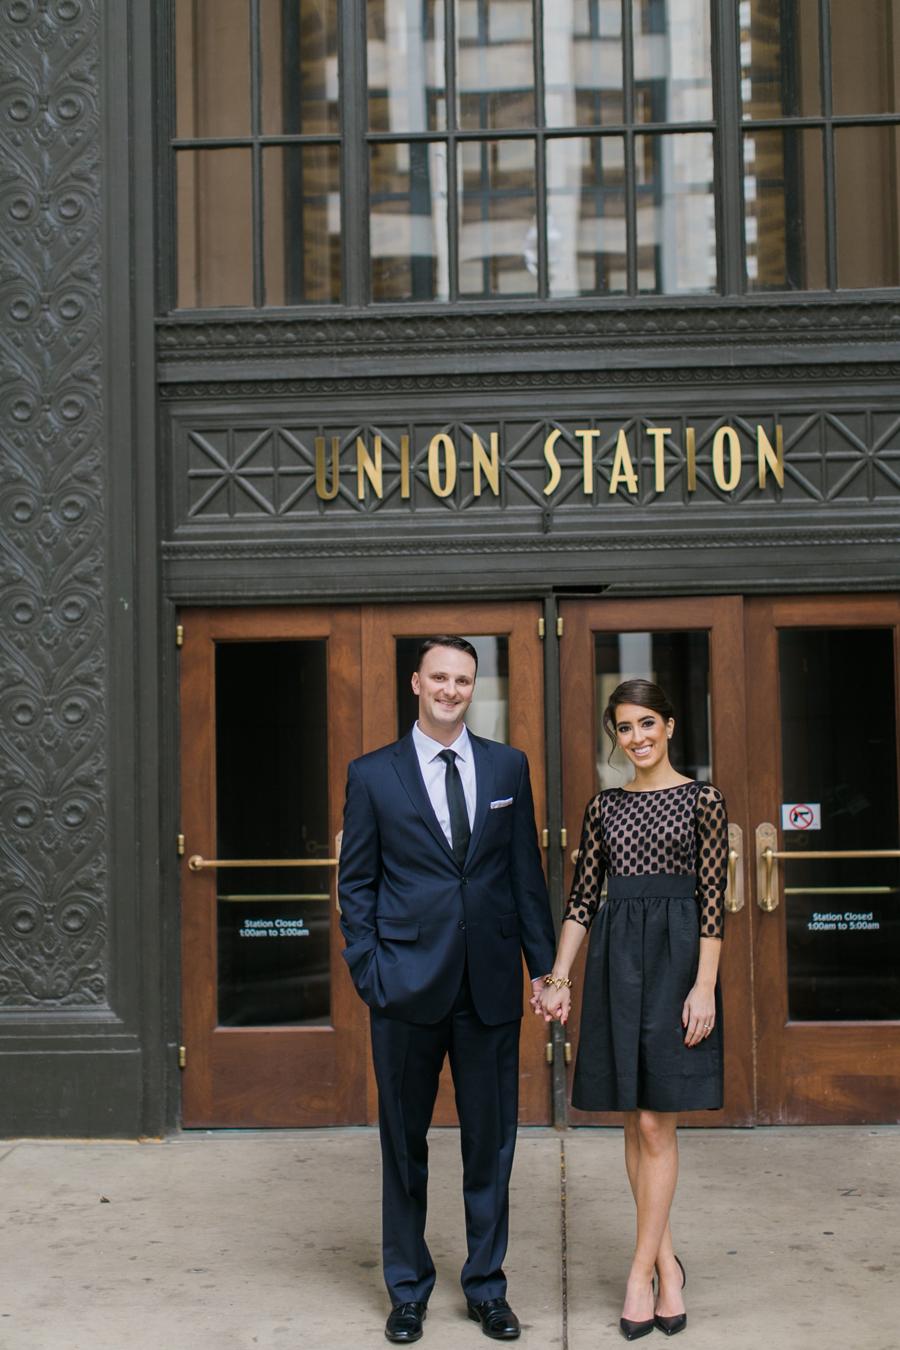 chicago-union-station-wedding-photos-010